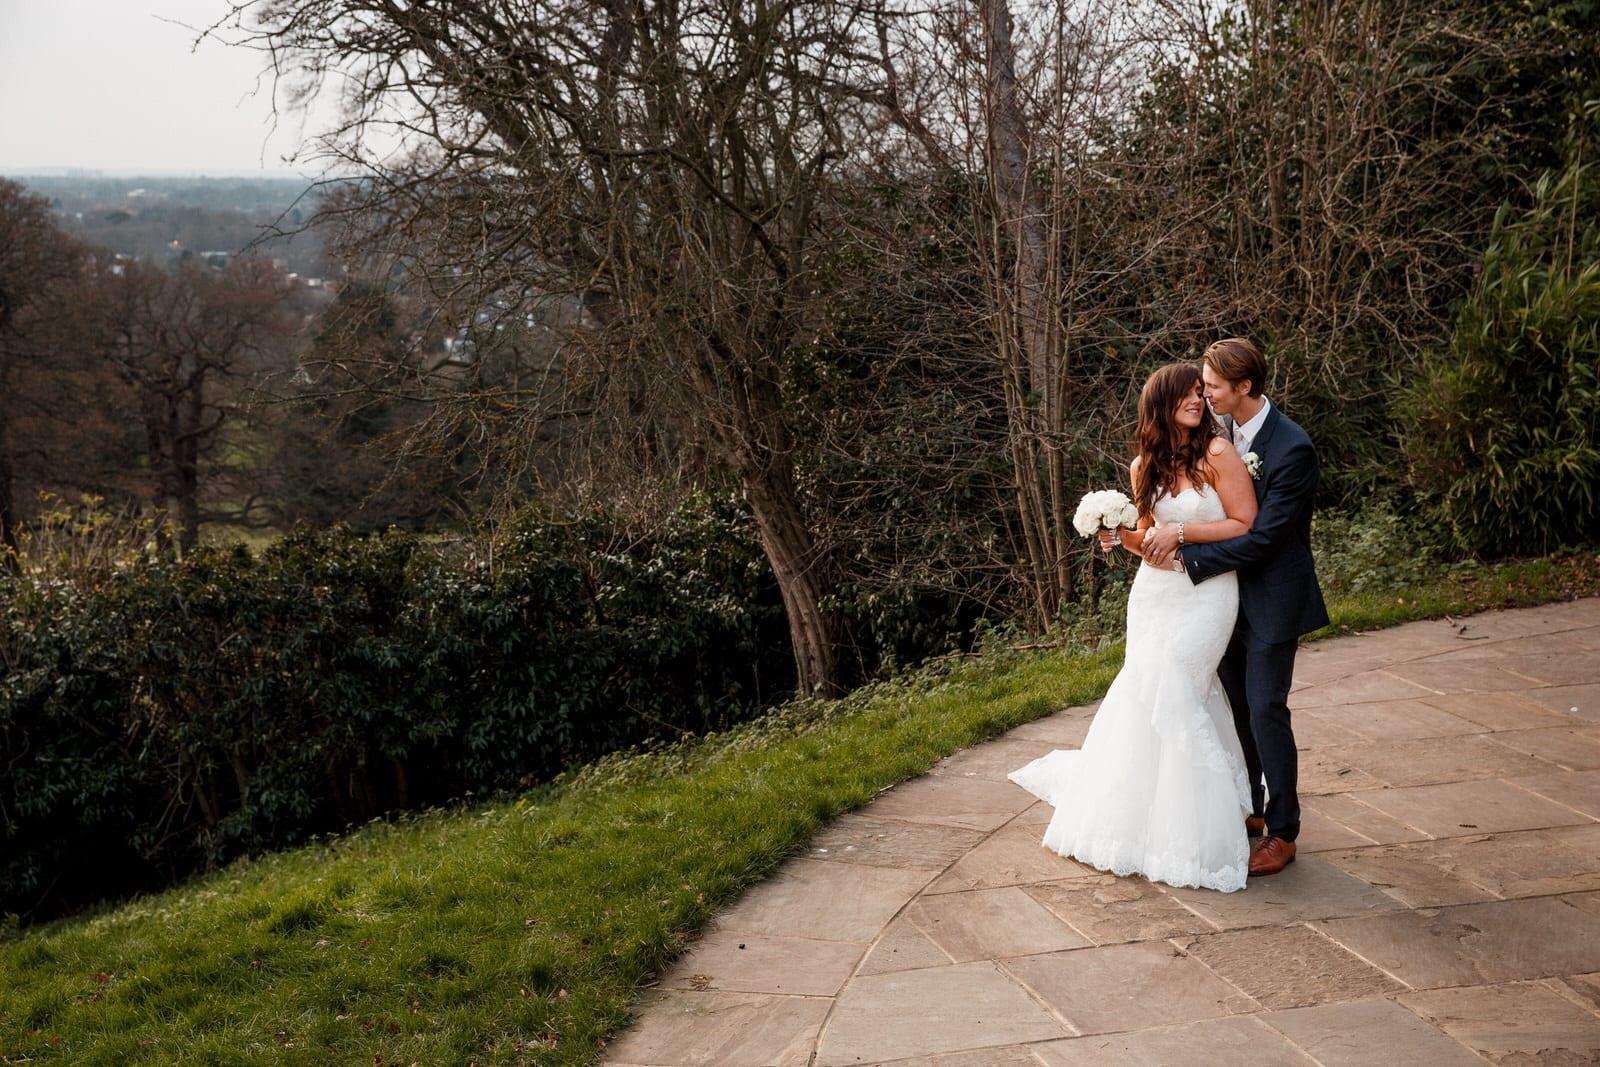 newlywed wedding photography at pembroke lodge richmond park